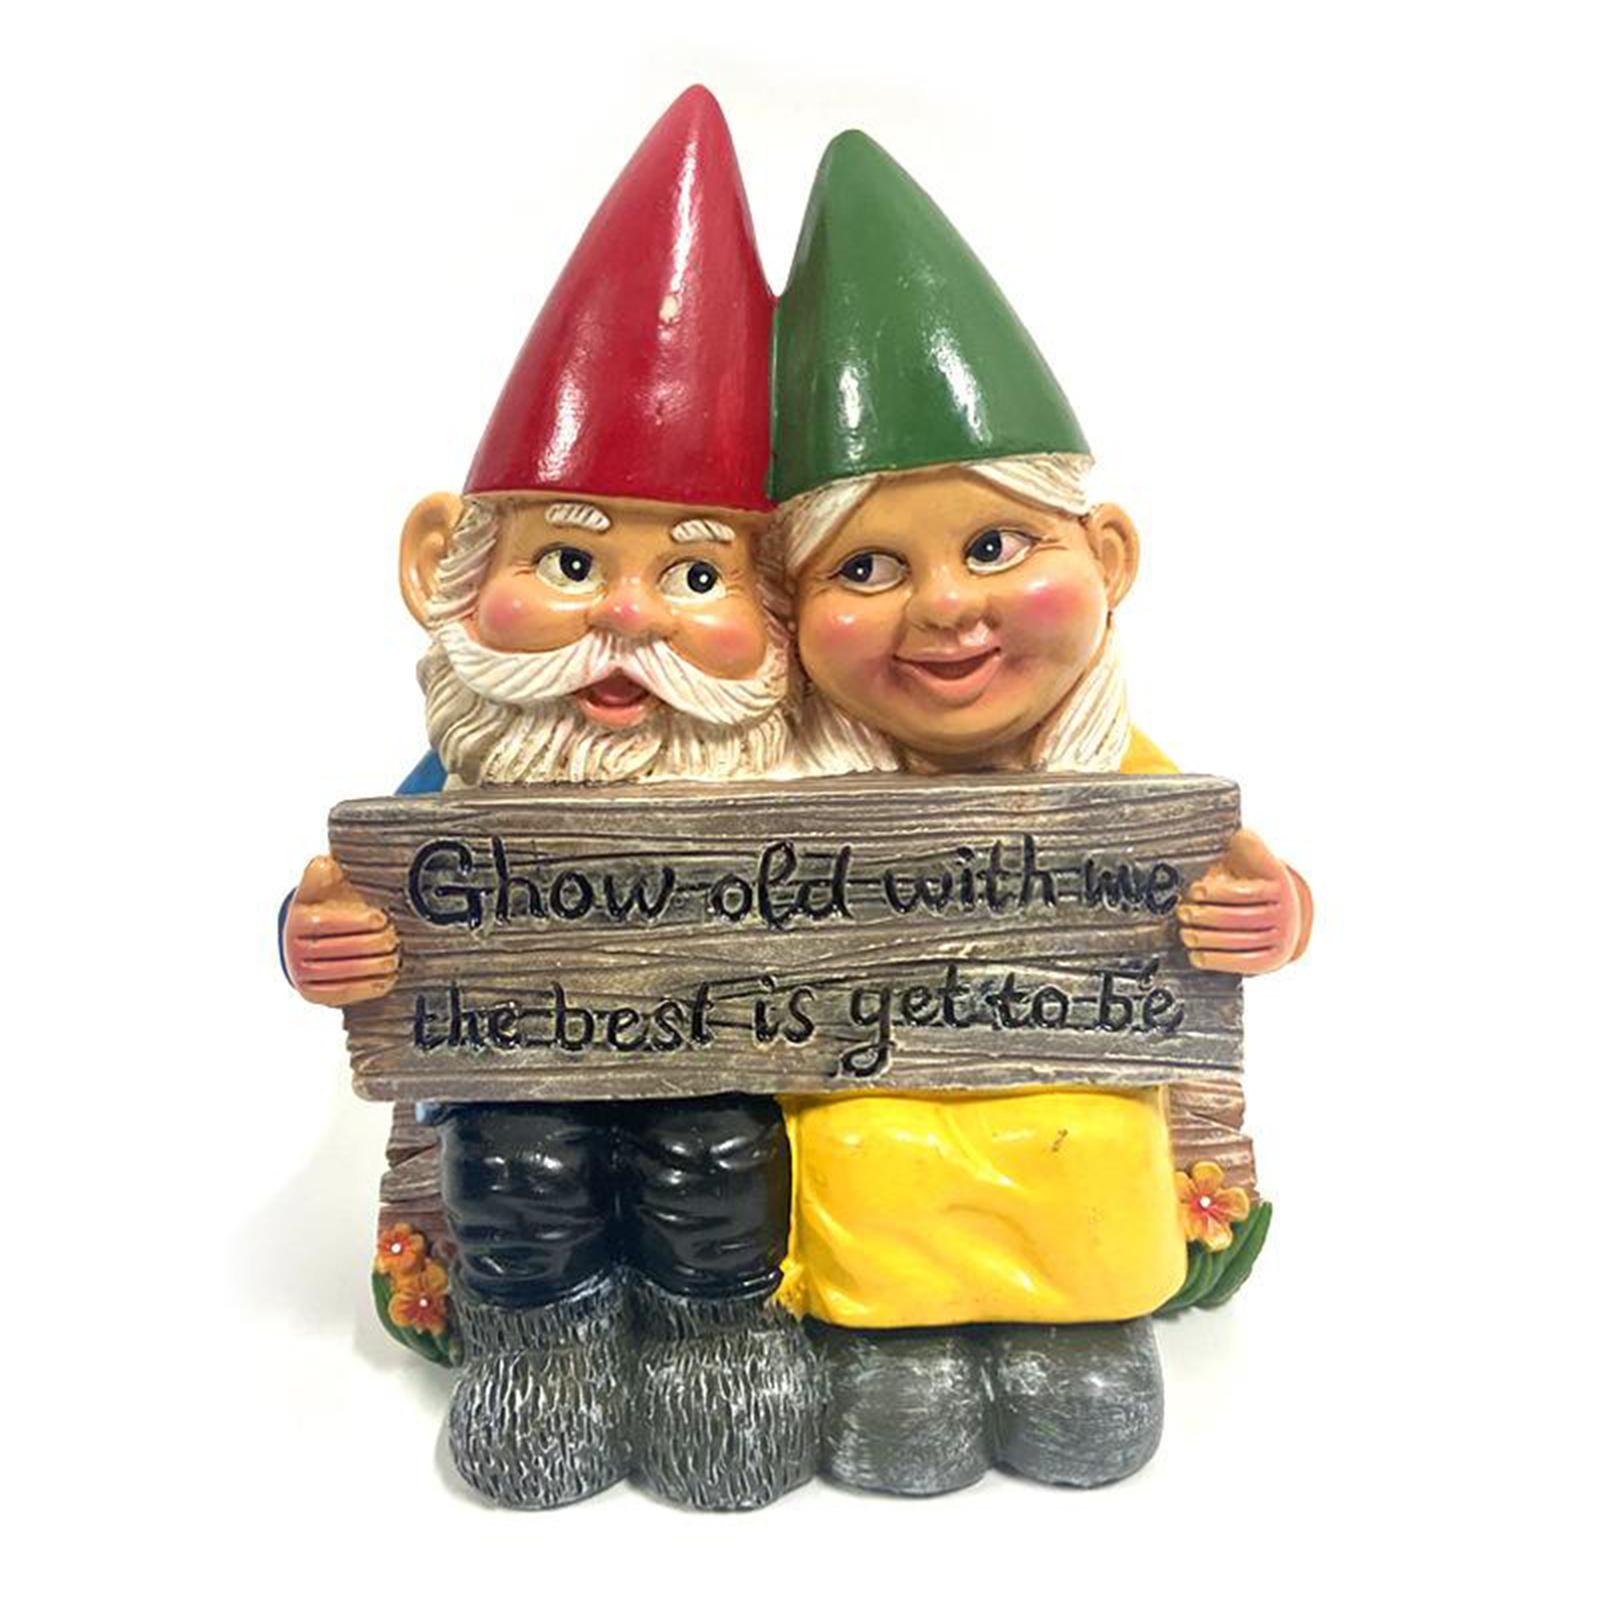 thumbnail 28 - Funny Resin Naughty Garden Gnome Statue Ornaments Villa Home Figurines Decor AU